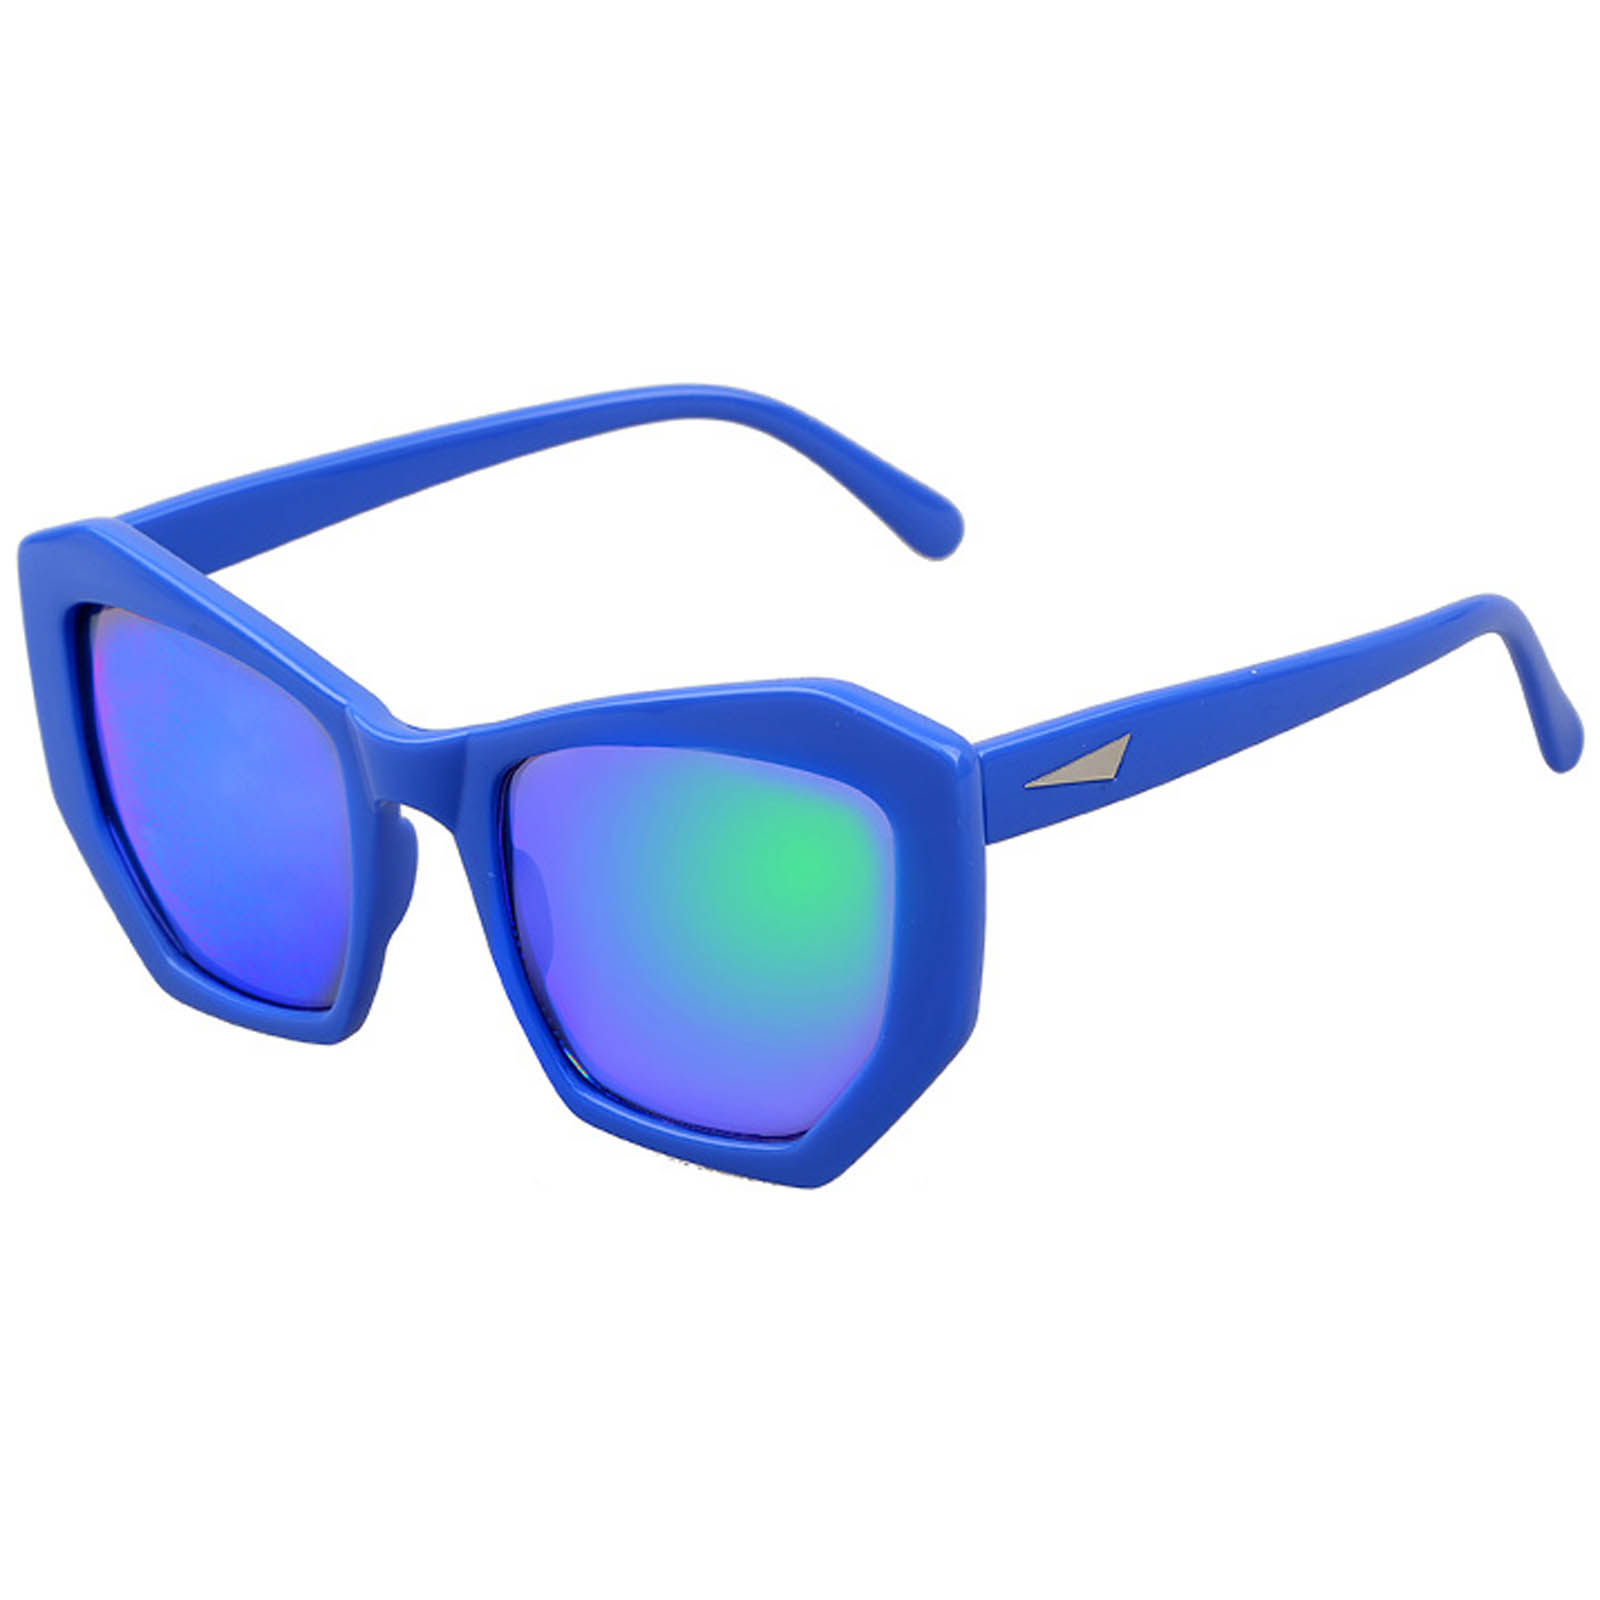 de90bdfc3b OWL ® 059 C3 Cat Pentagon Eyewear Sunglasses Women s Men s Plastic Blue  Frame Blue Lens One